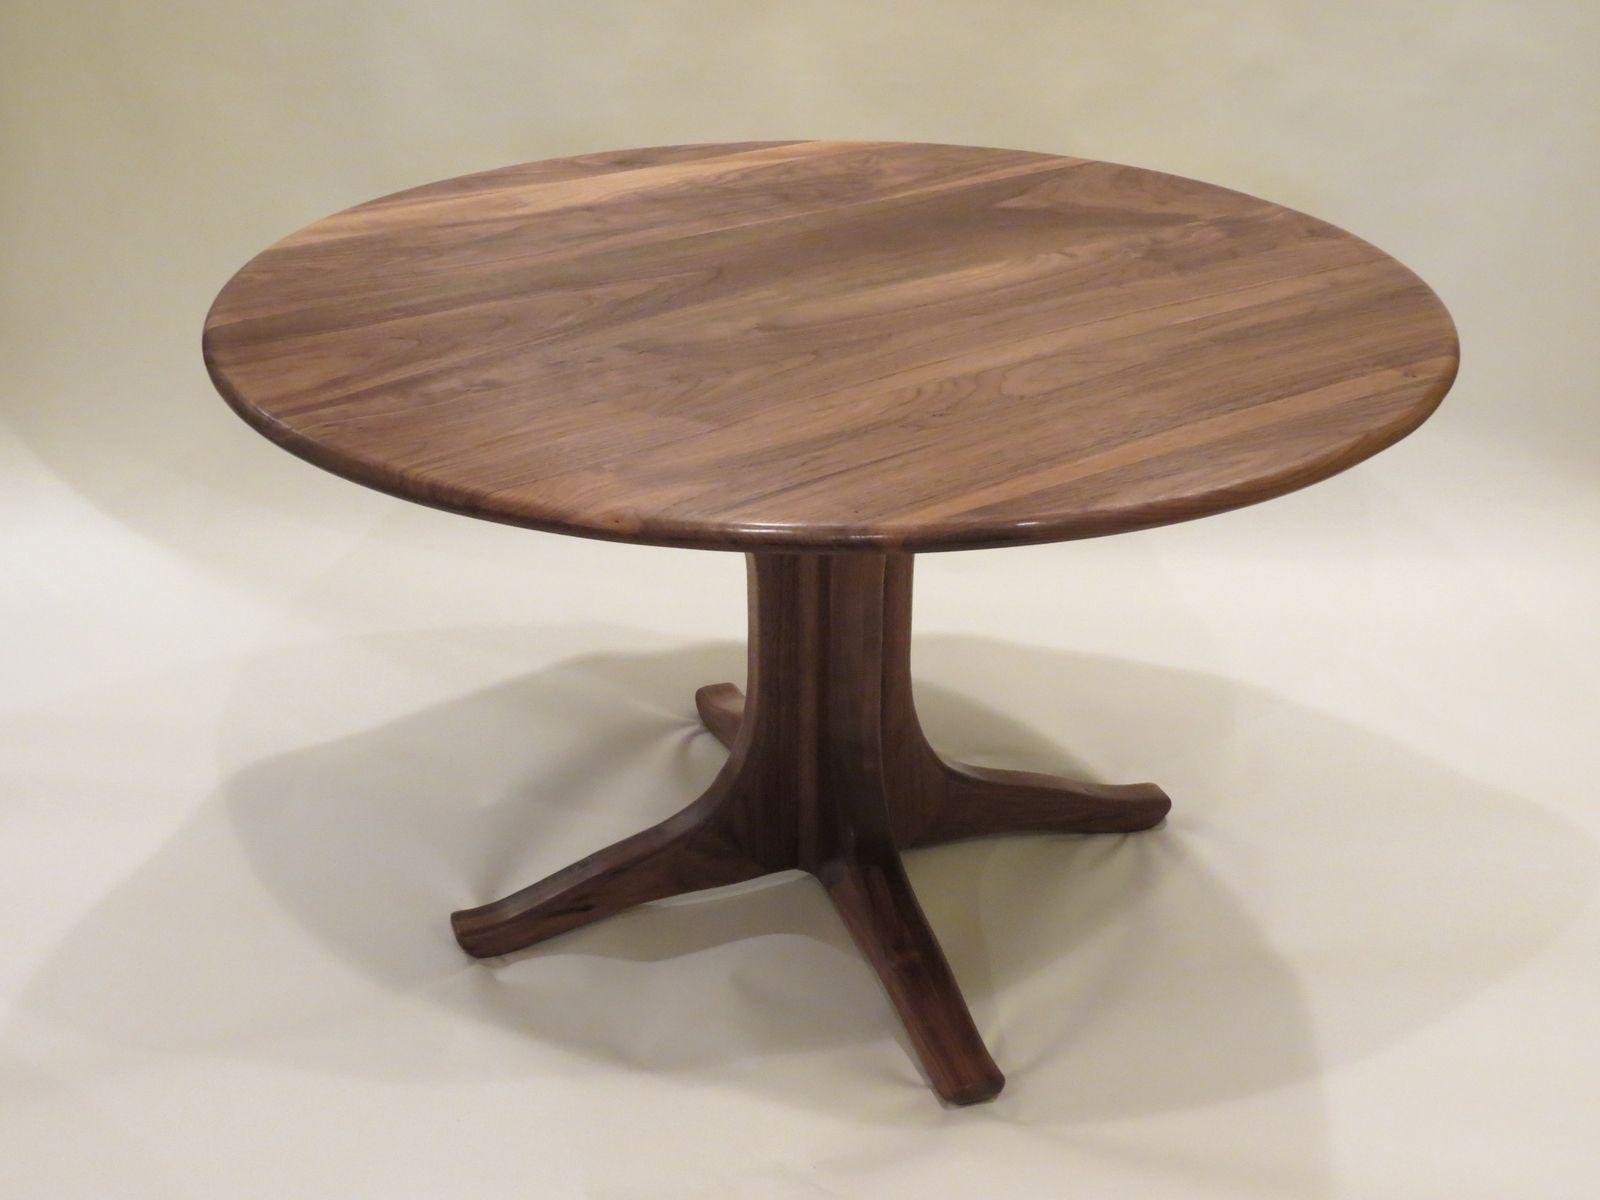 Custom Walnut Pedestal Dining Table By Lost Creek